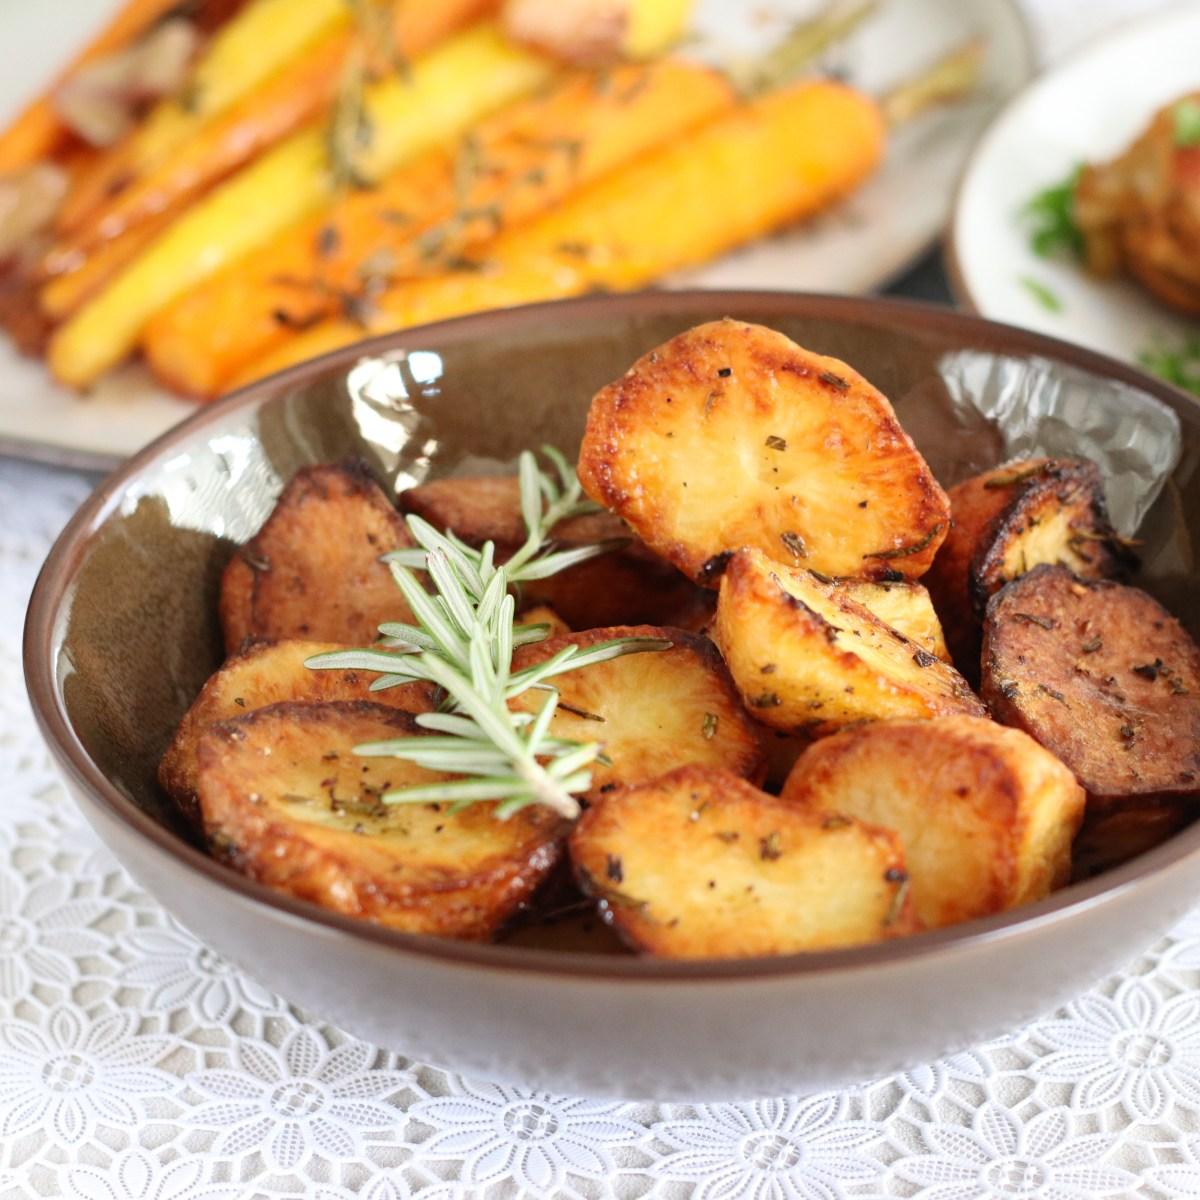 Geroosterde aardappels